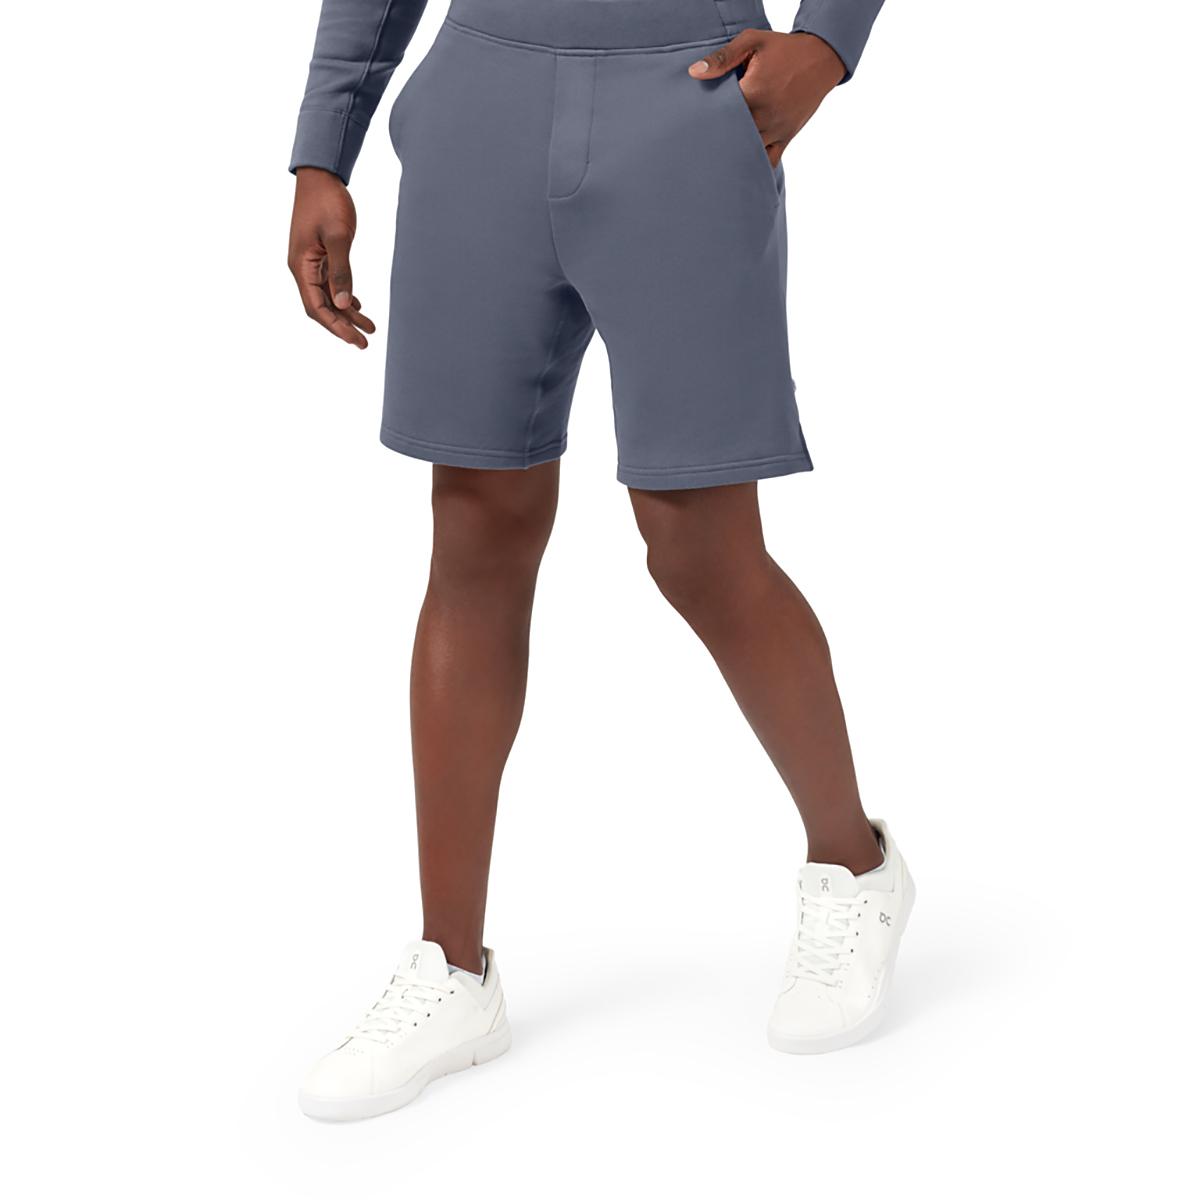 Men's On Sweat Shorts - Color: Dark - Size: S, Dark, large, image 1